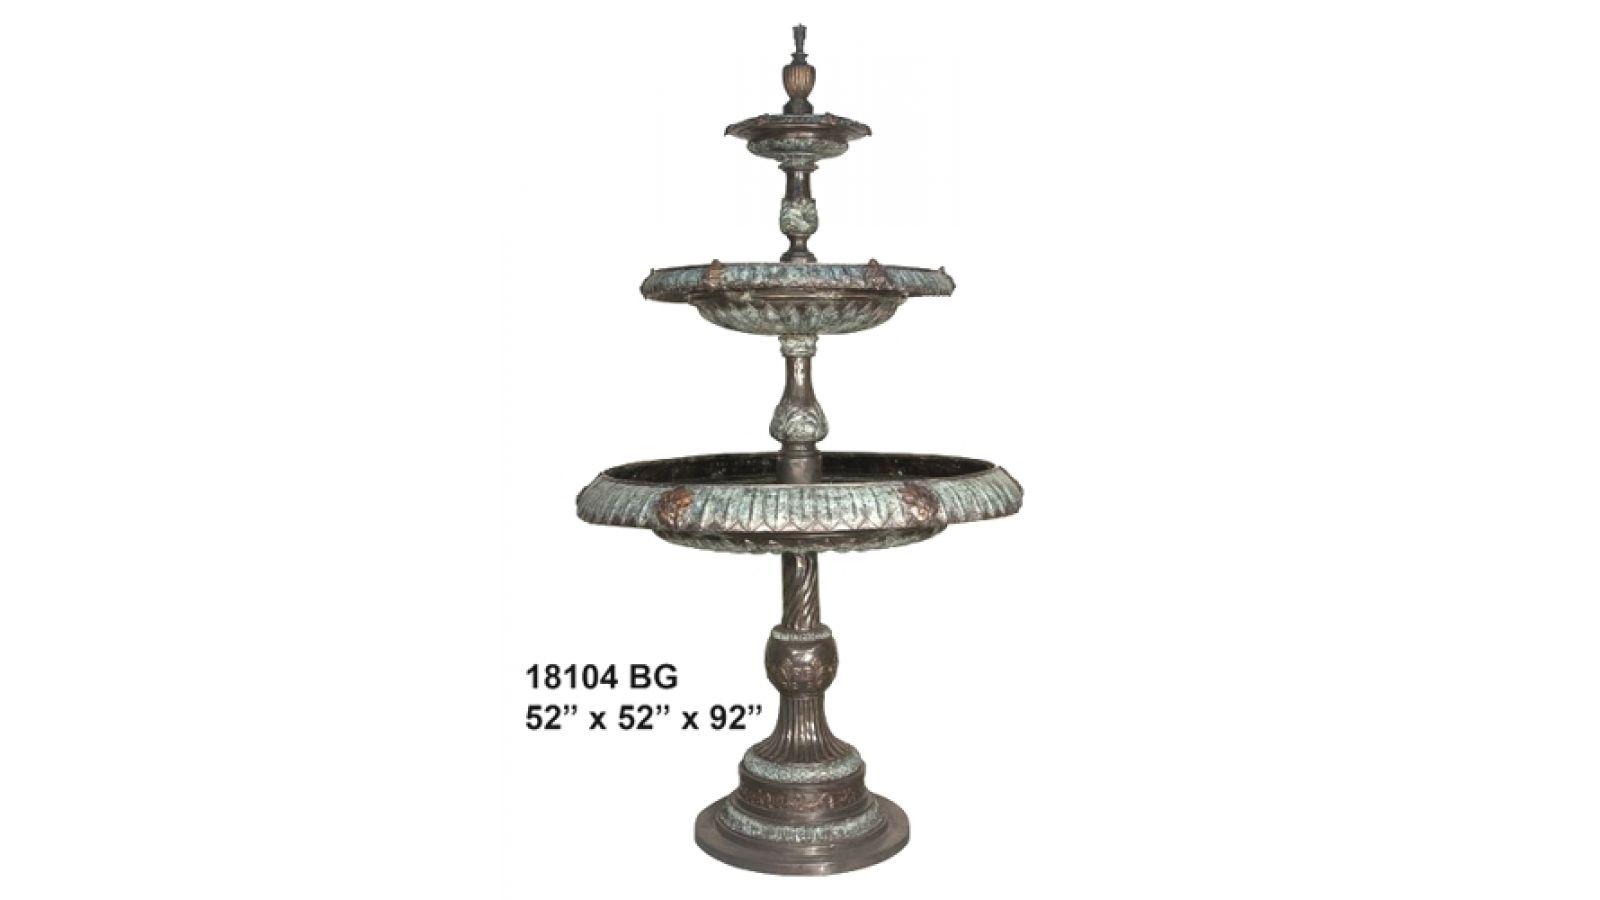 Bronze Decorative Water Fountains